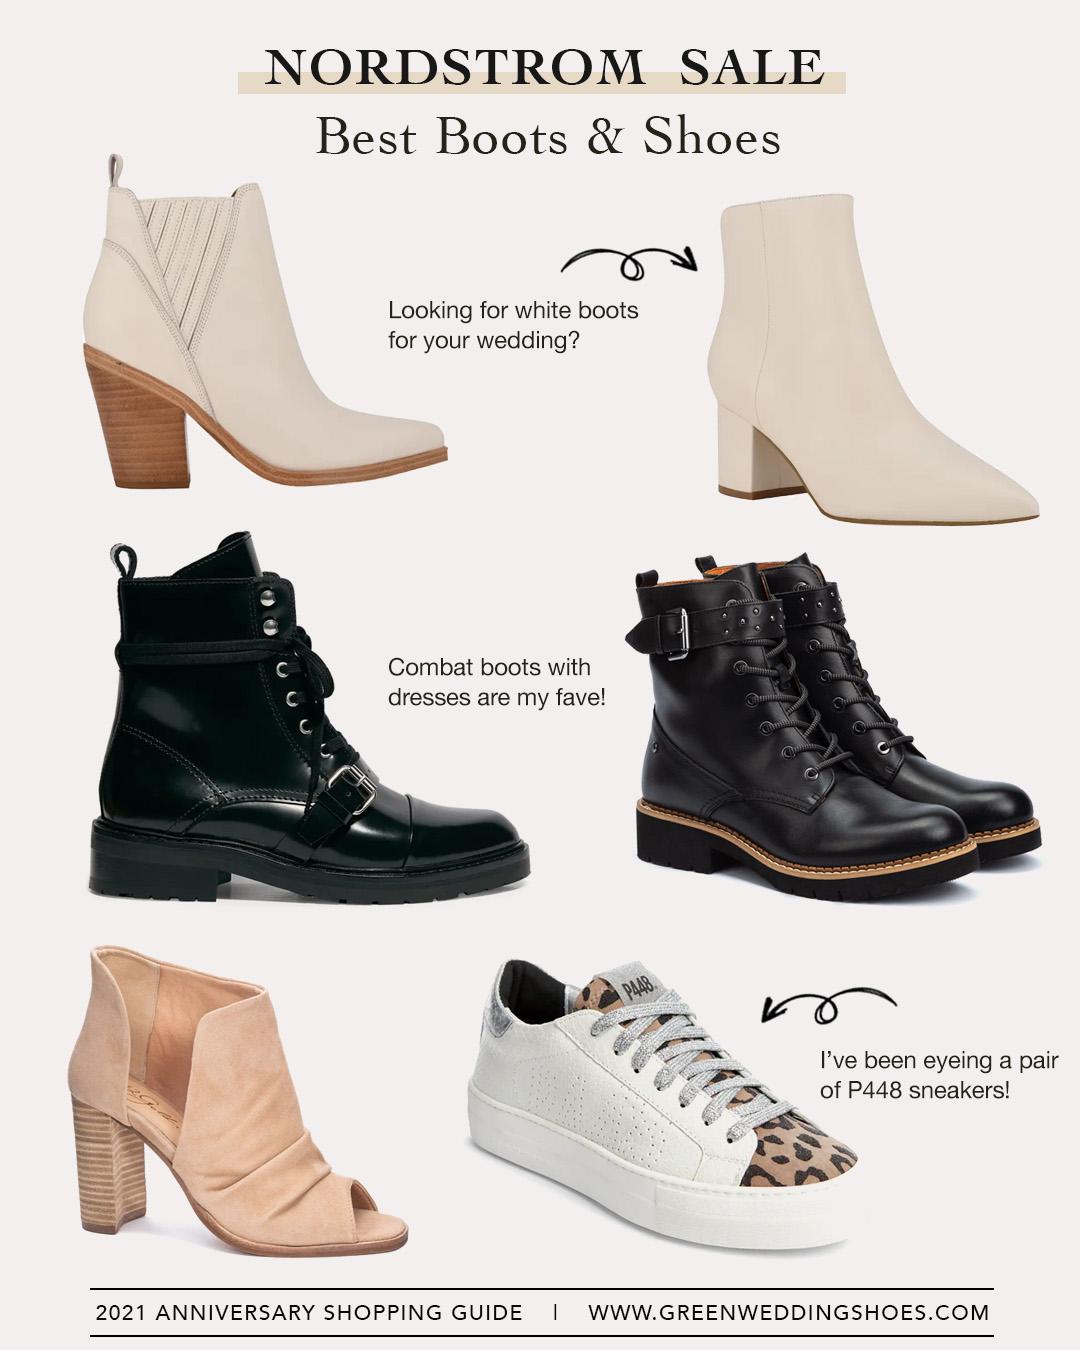 Nordstrom Sale Shoes 2021